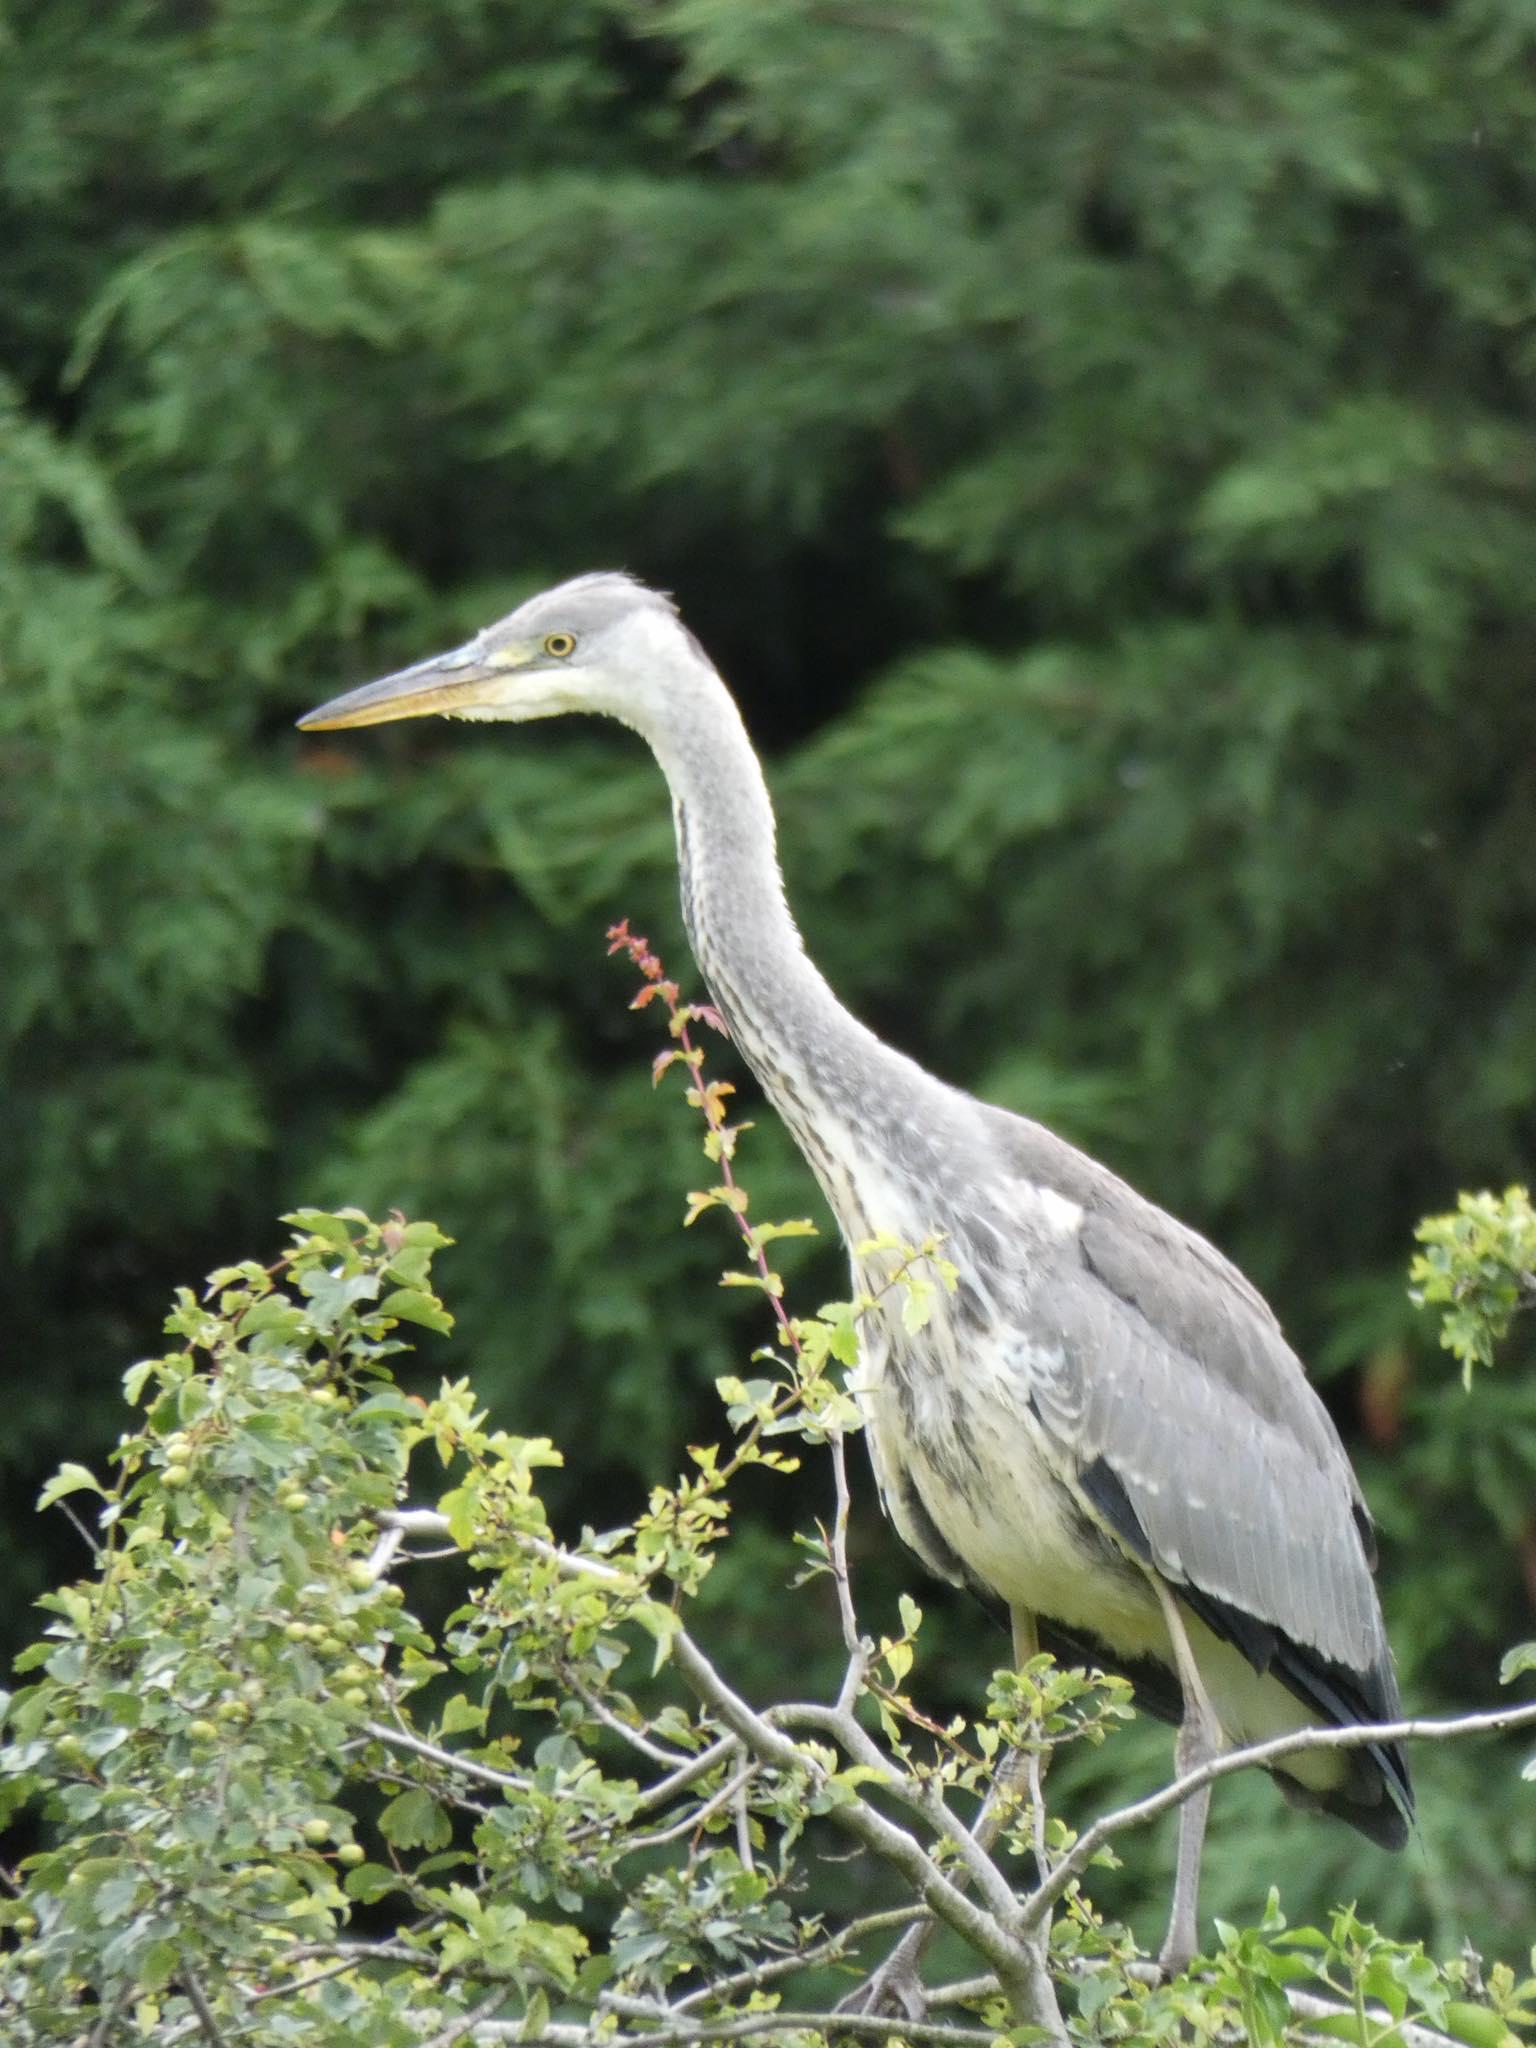 Heron at Willersey pond